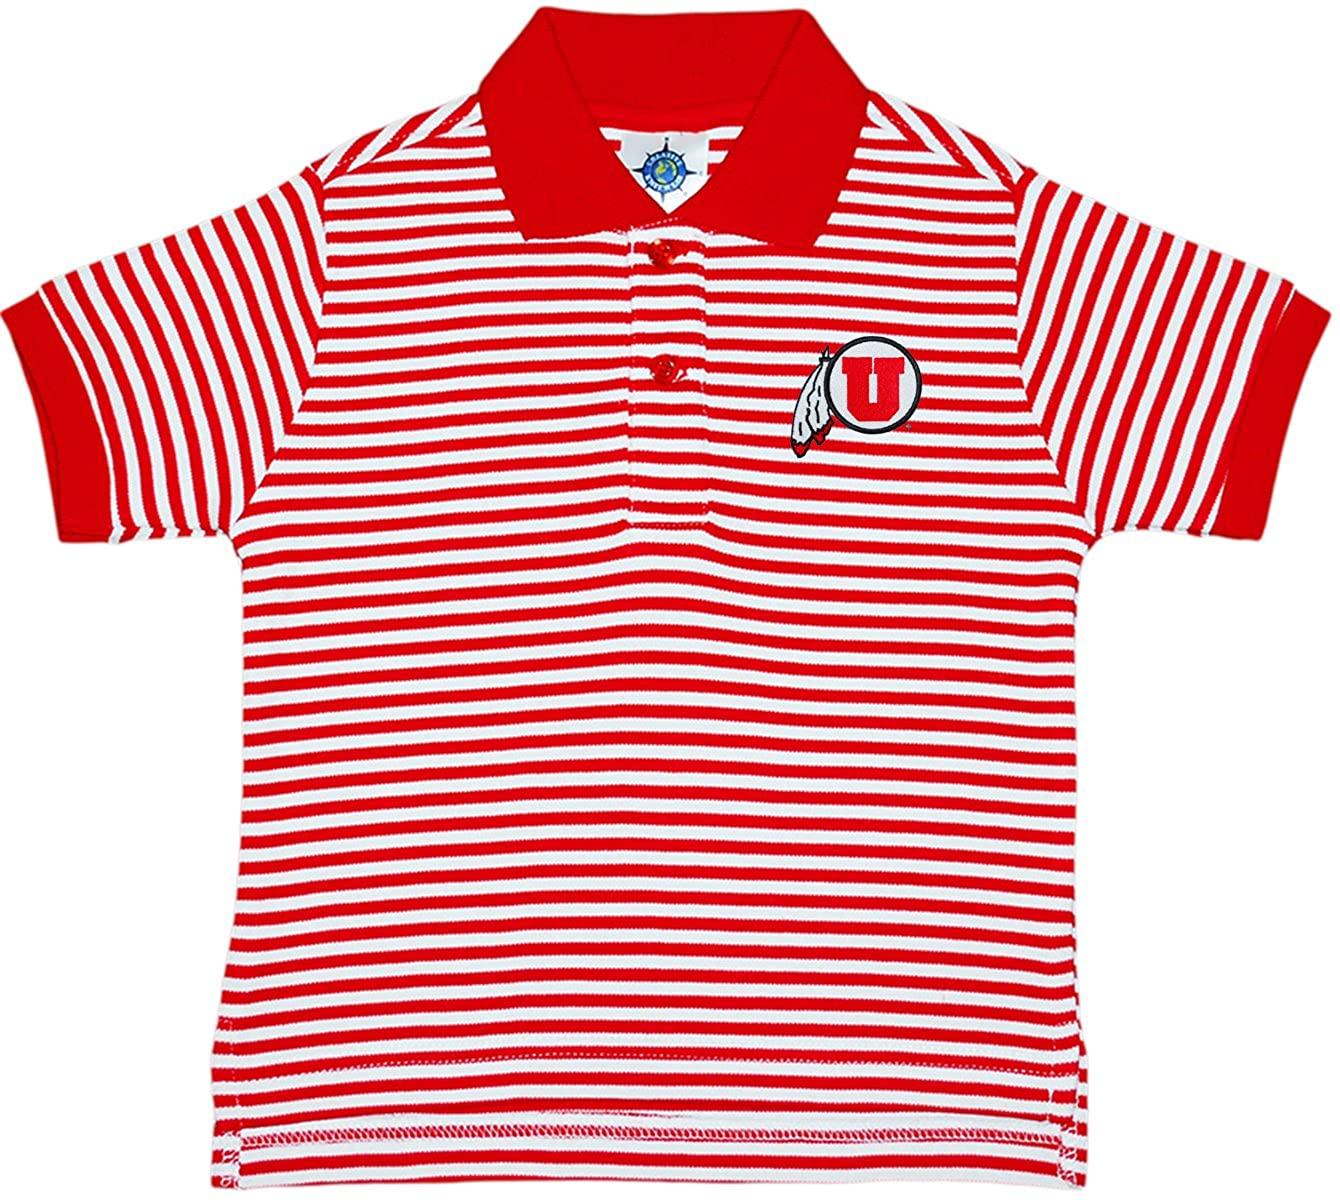 Creative Knitwear University of Utah Utes Striped Polo Shirt